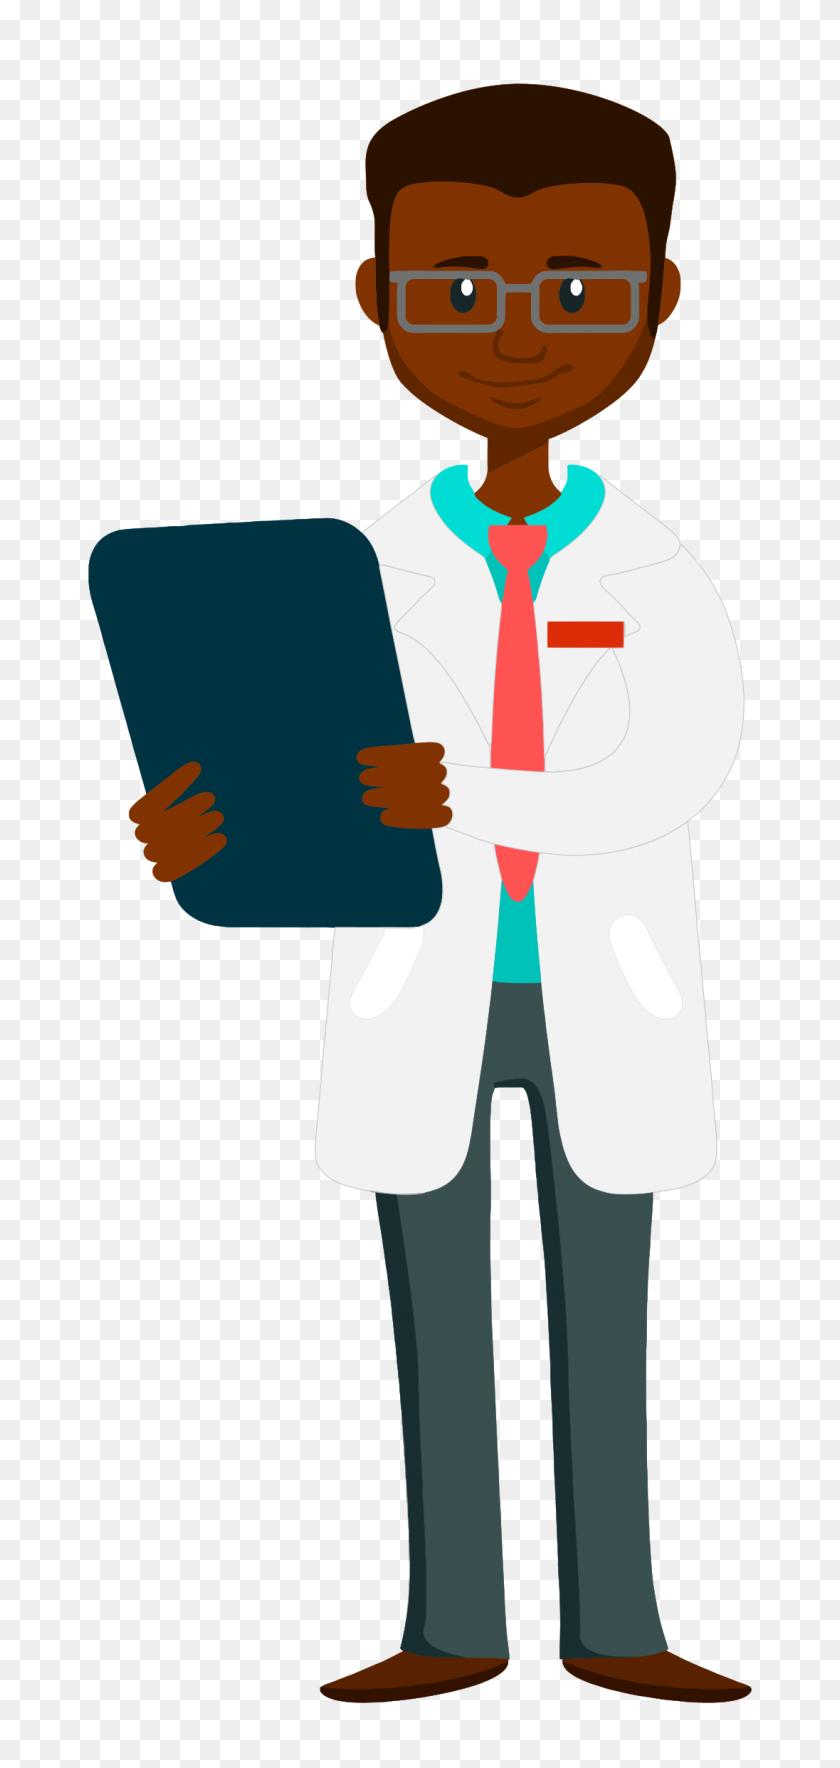 Clipart - Doctors Office Clipart